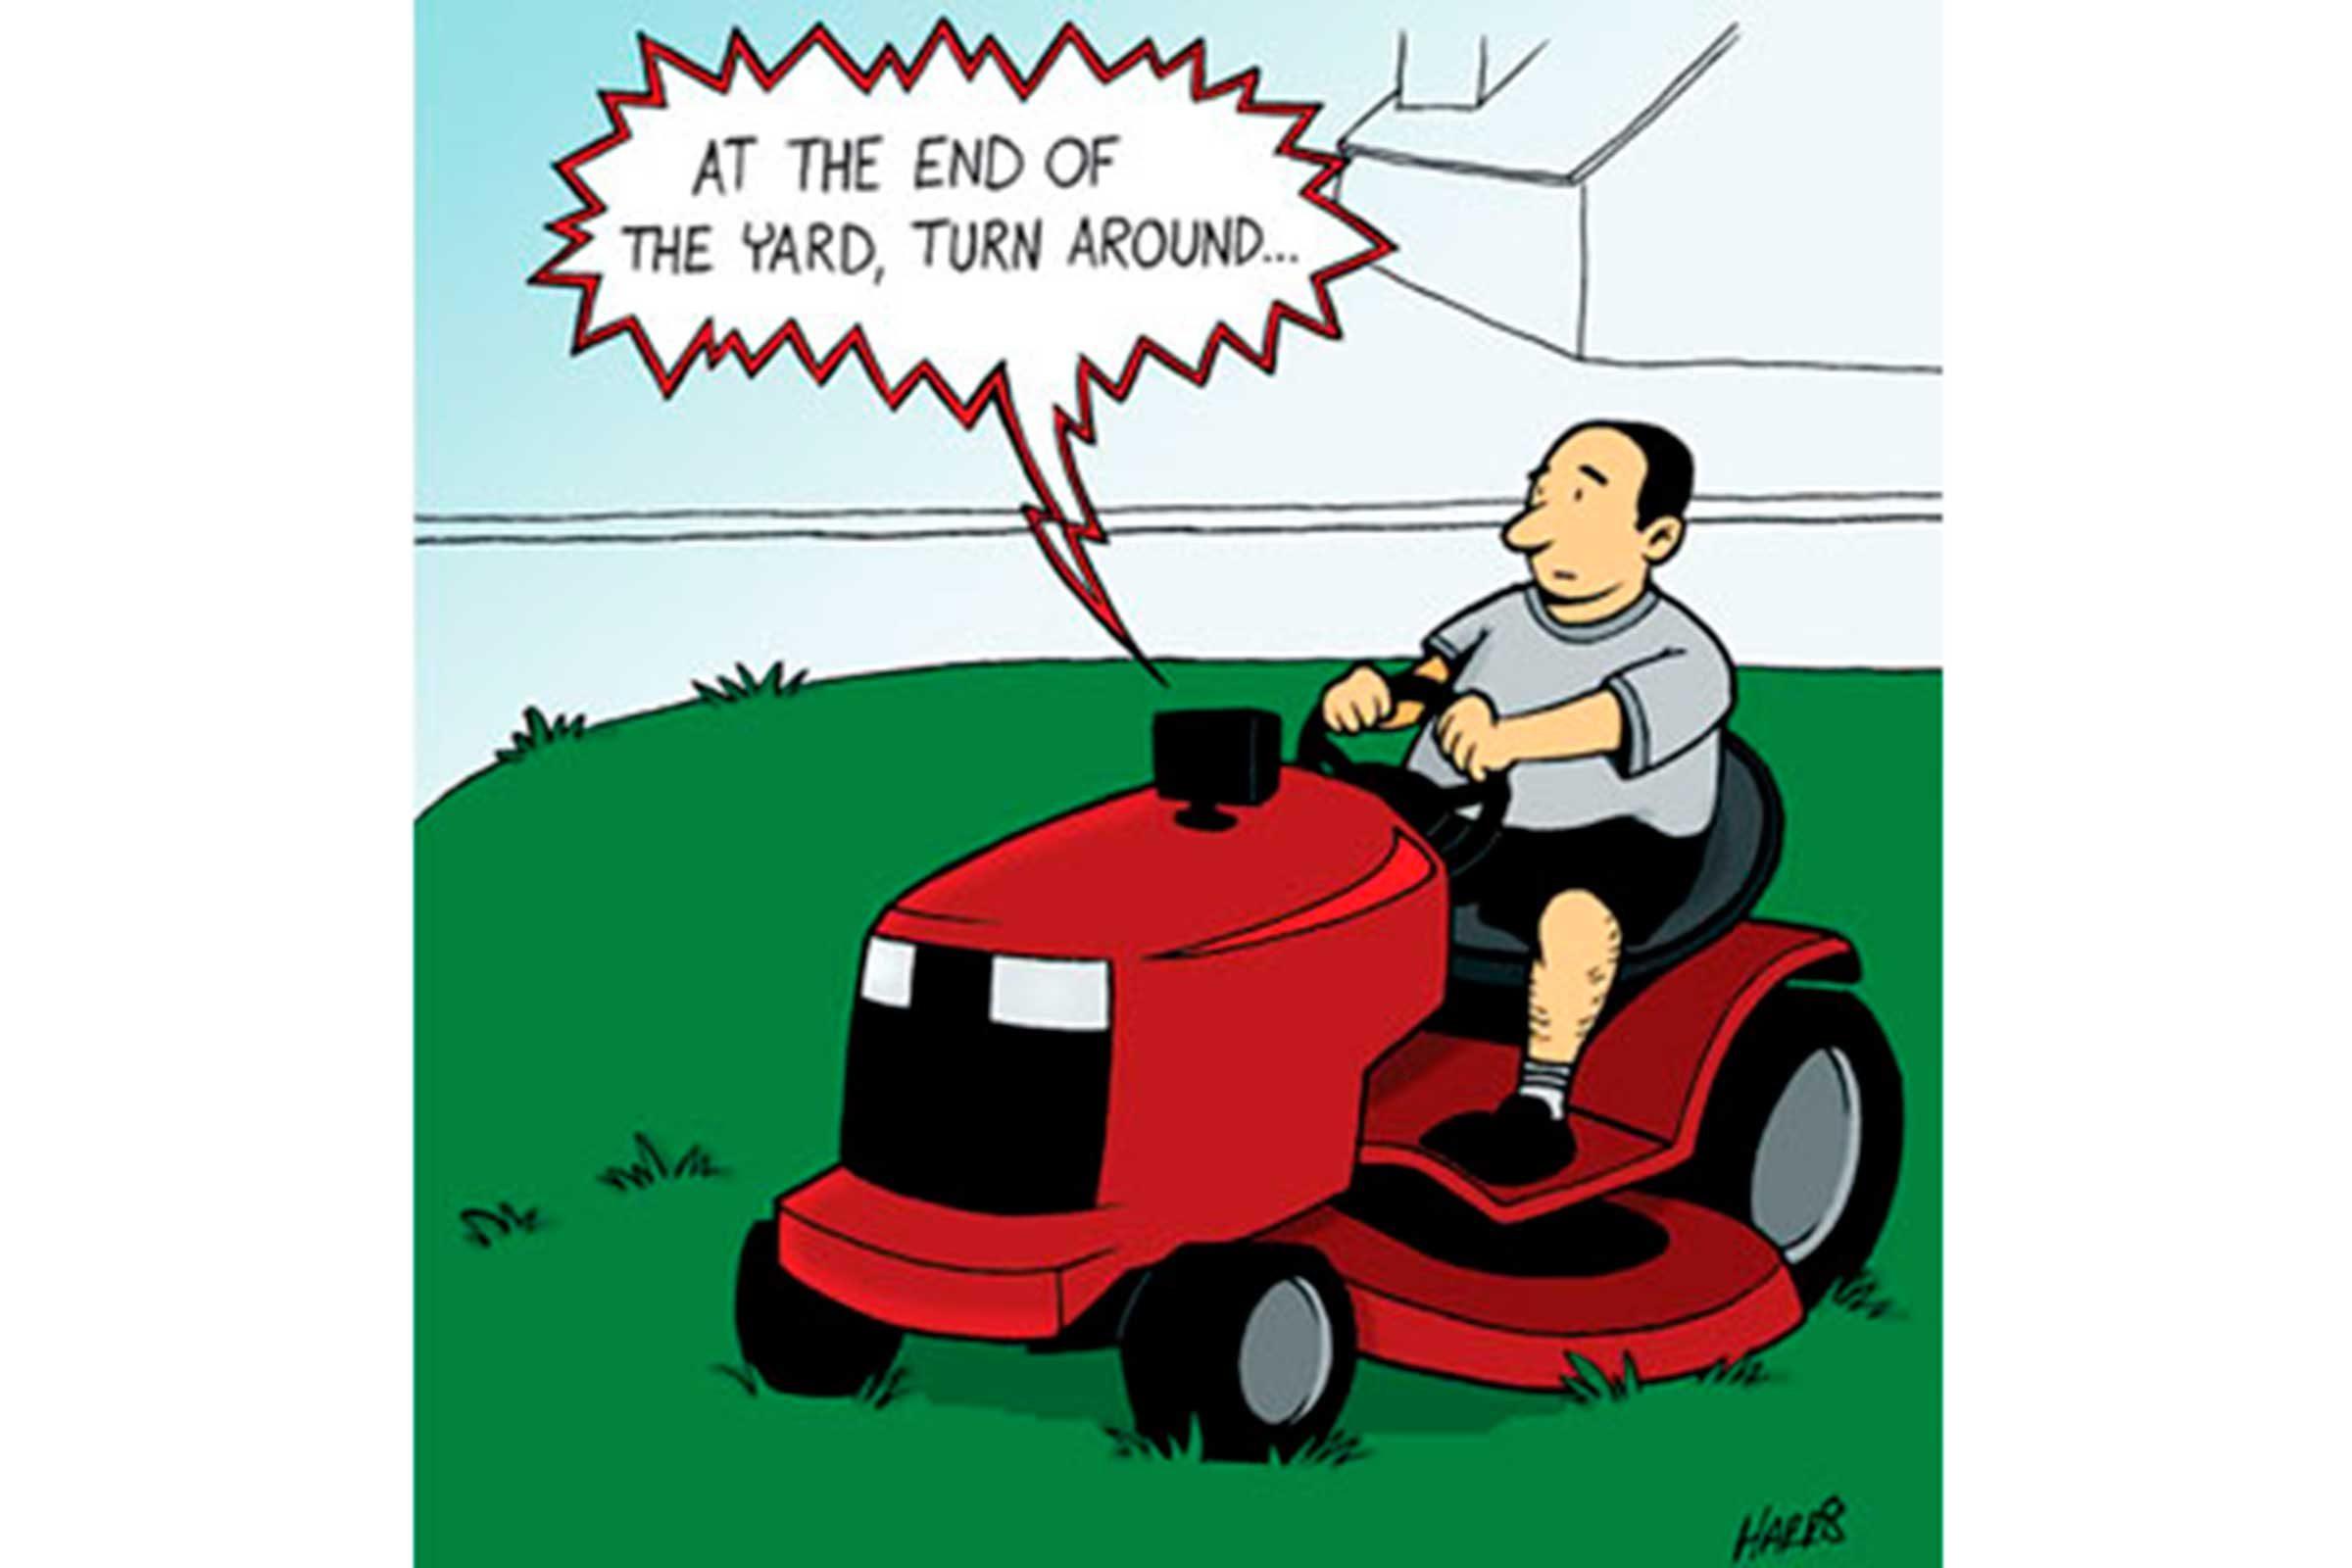 technology funny cartoons reader digest too russell harris jokes appreciate far goes technophobes summer